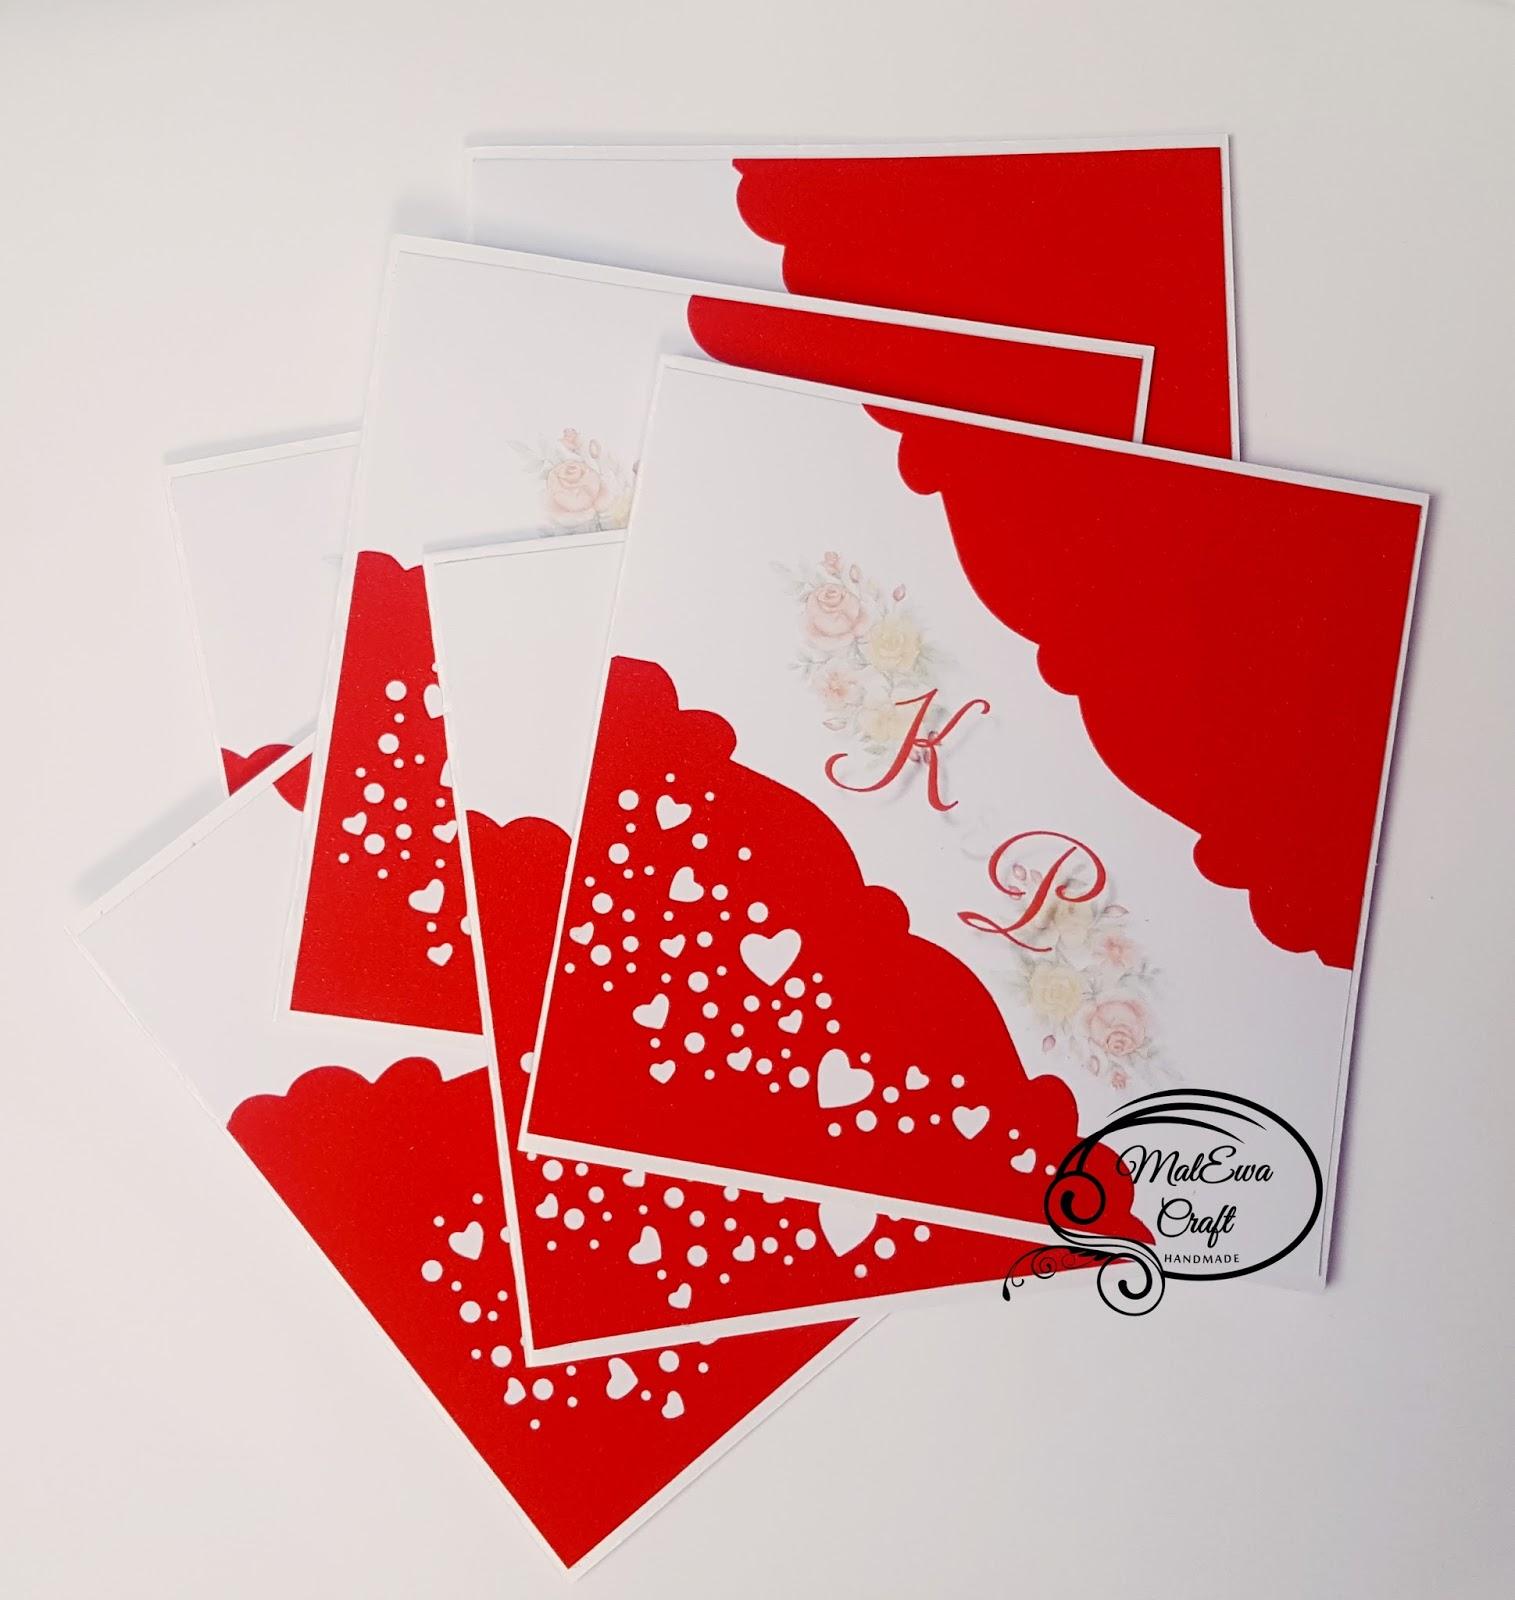 MalEwa Craft Handmade: Wedding invitations